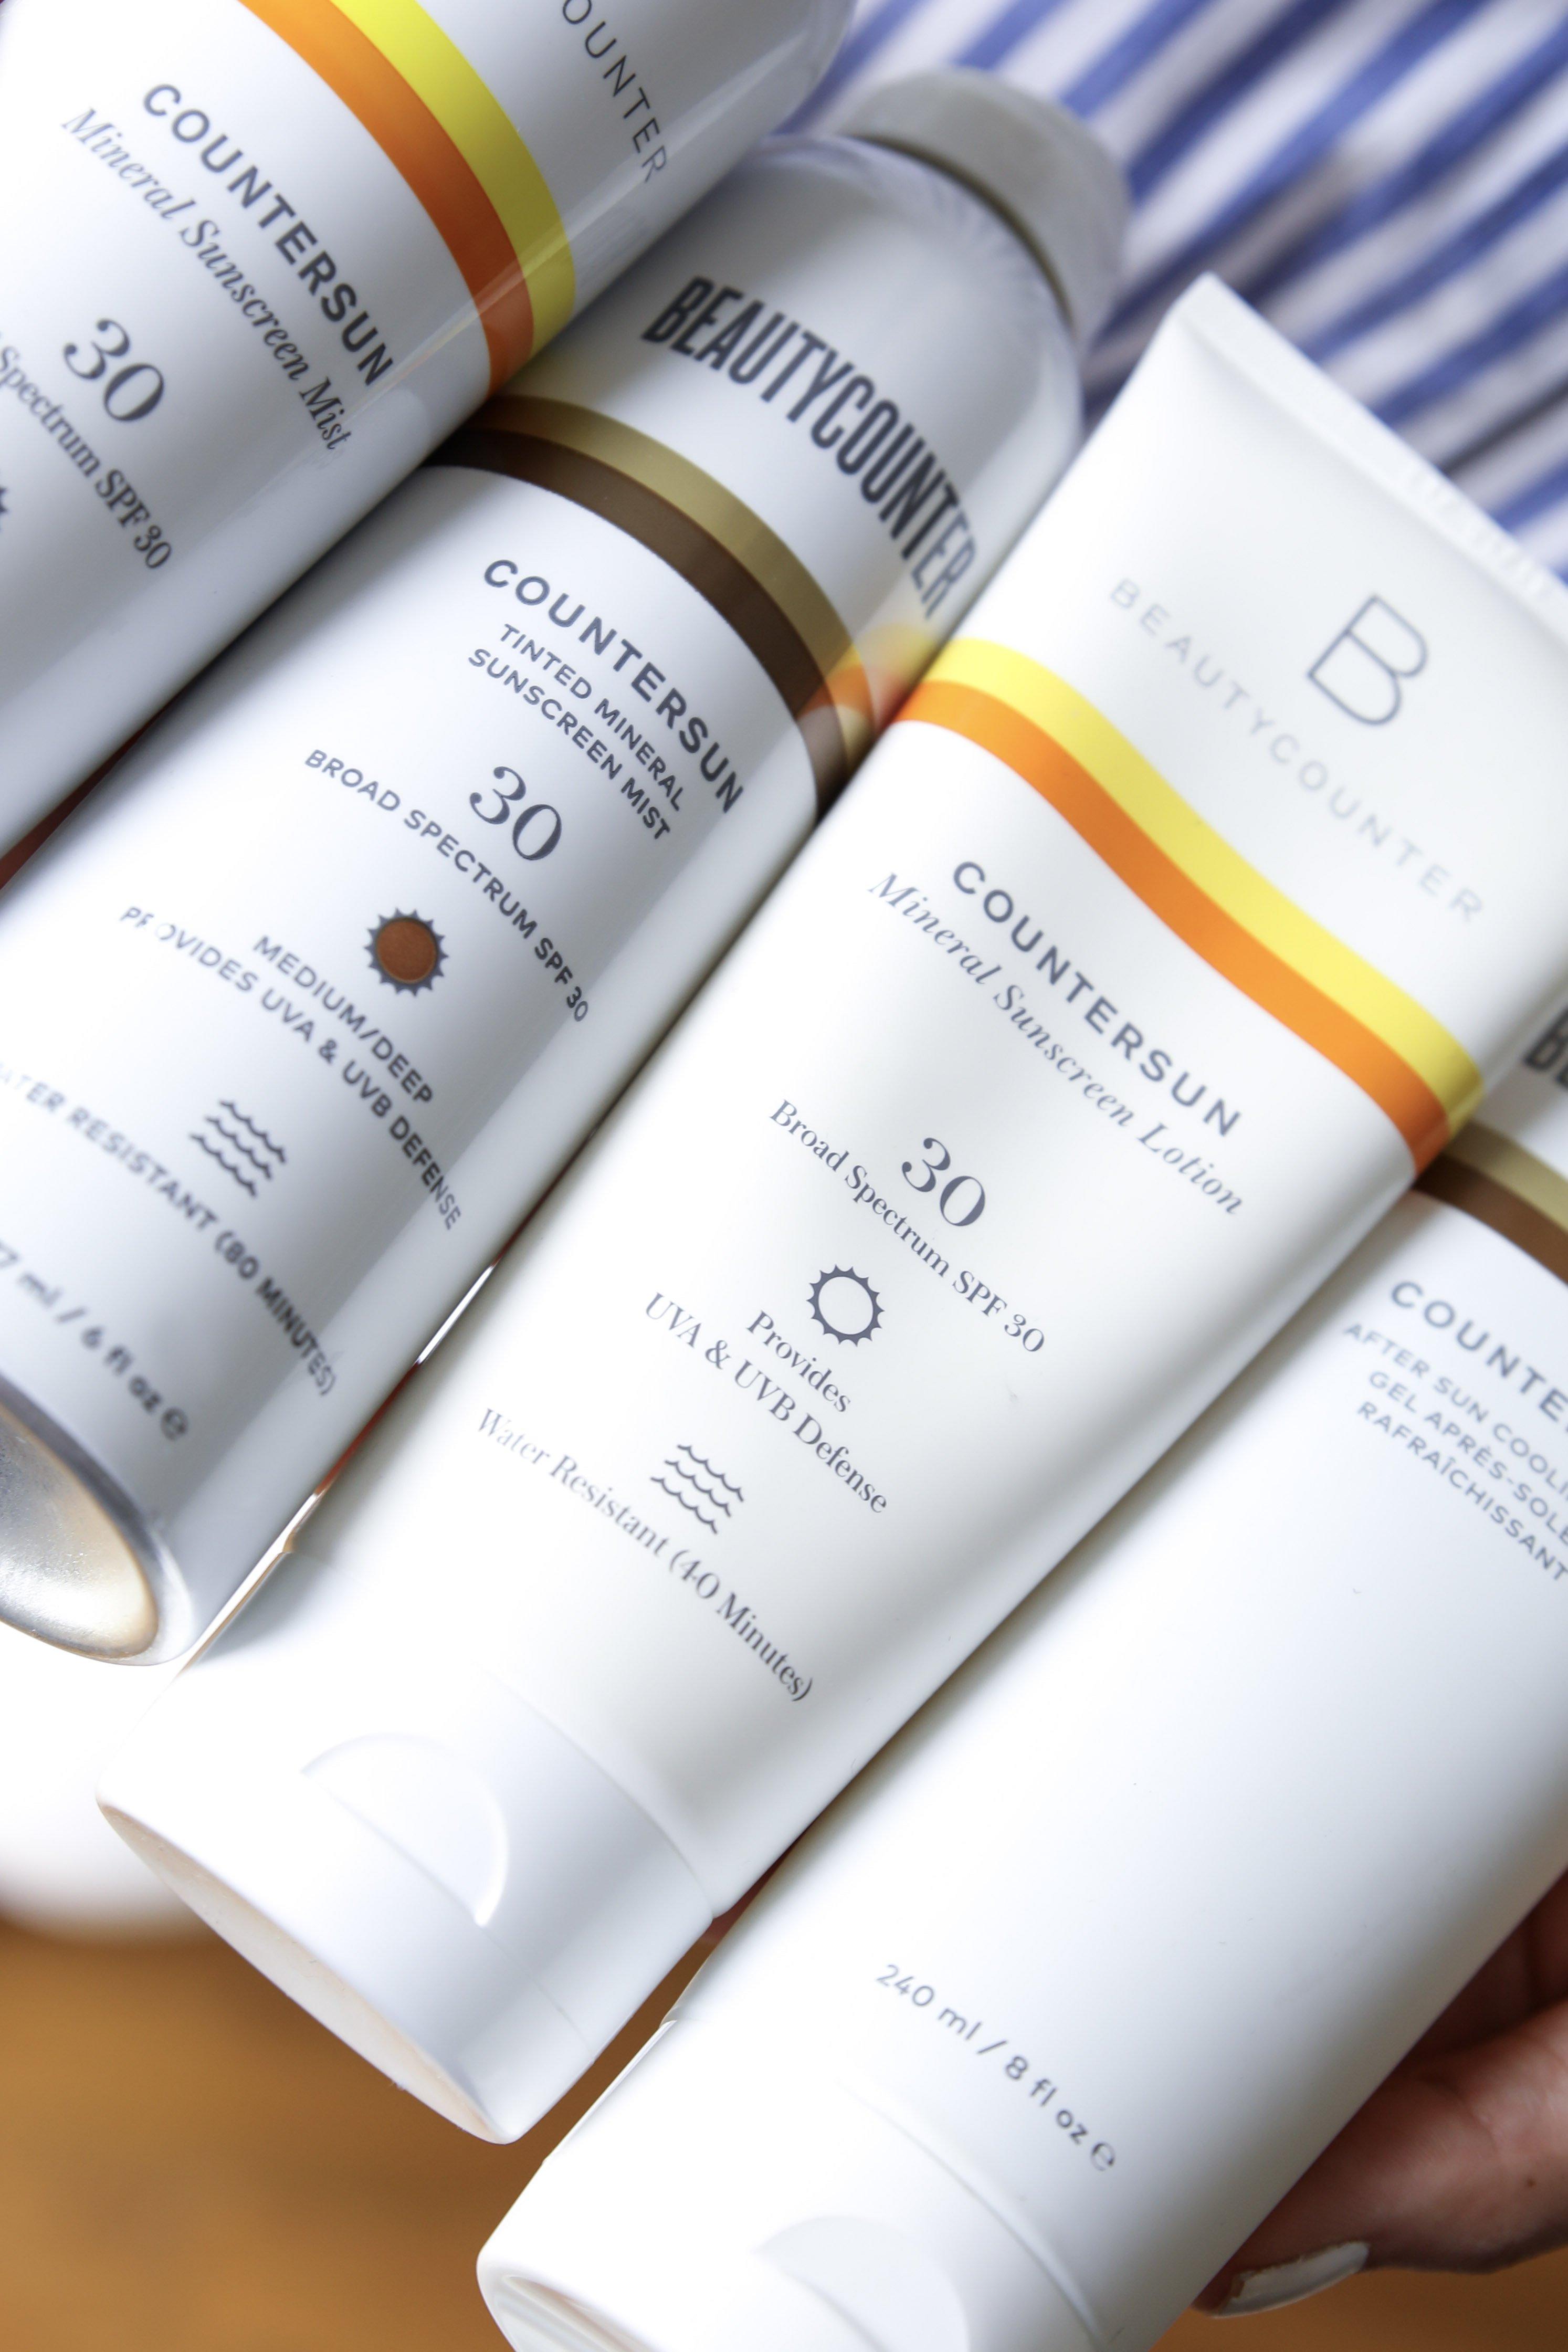 Image of sunscreen